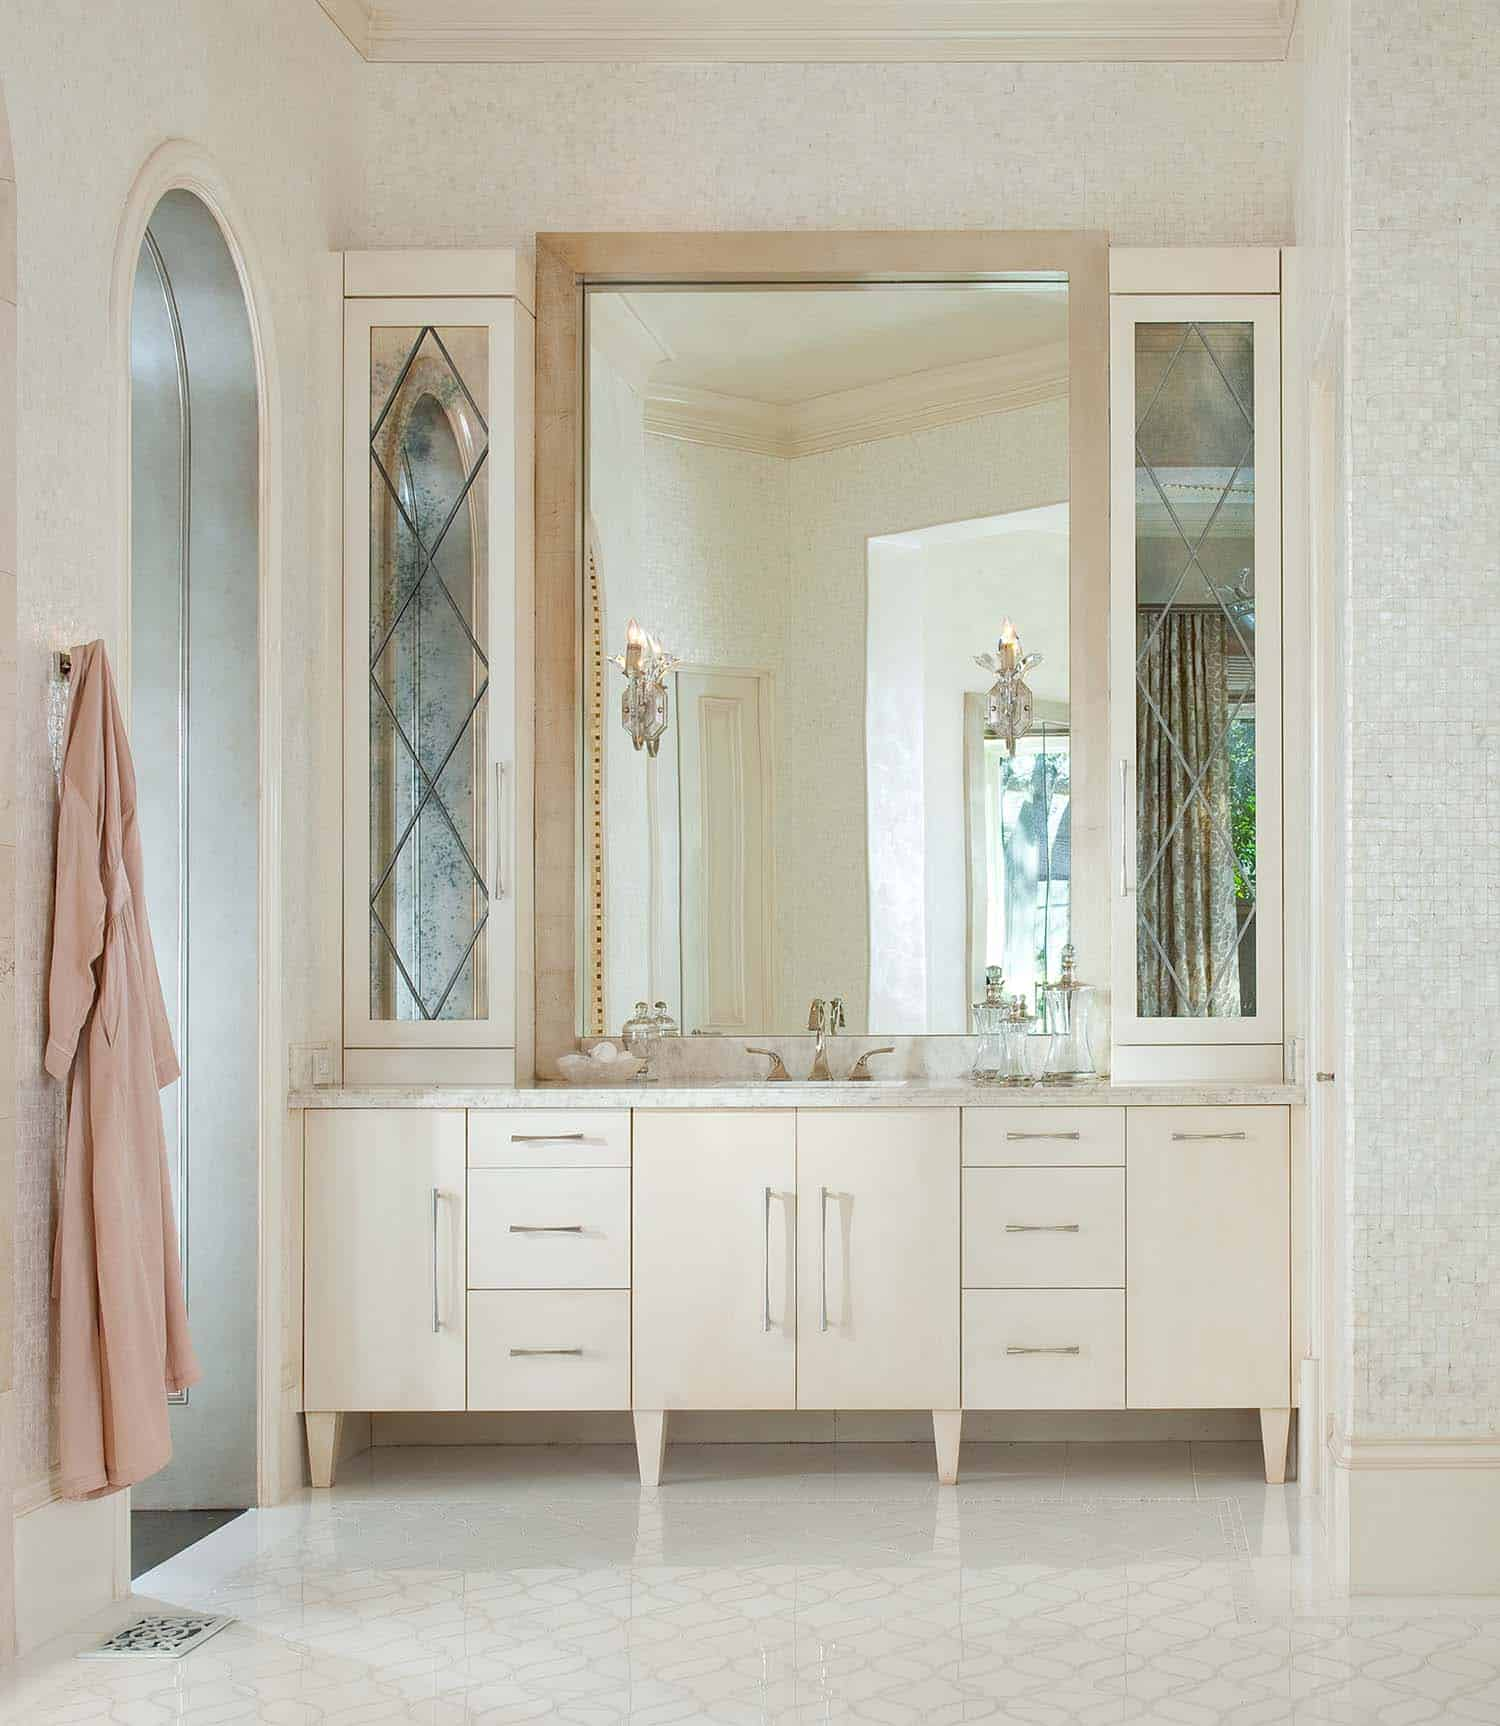 Contemporary Style Home-Dallas Design Group-20-1 Kindesign